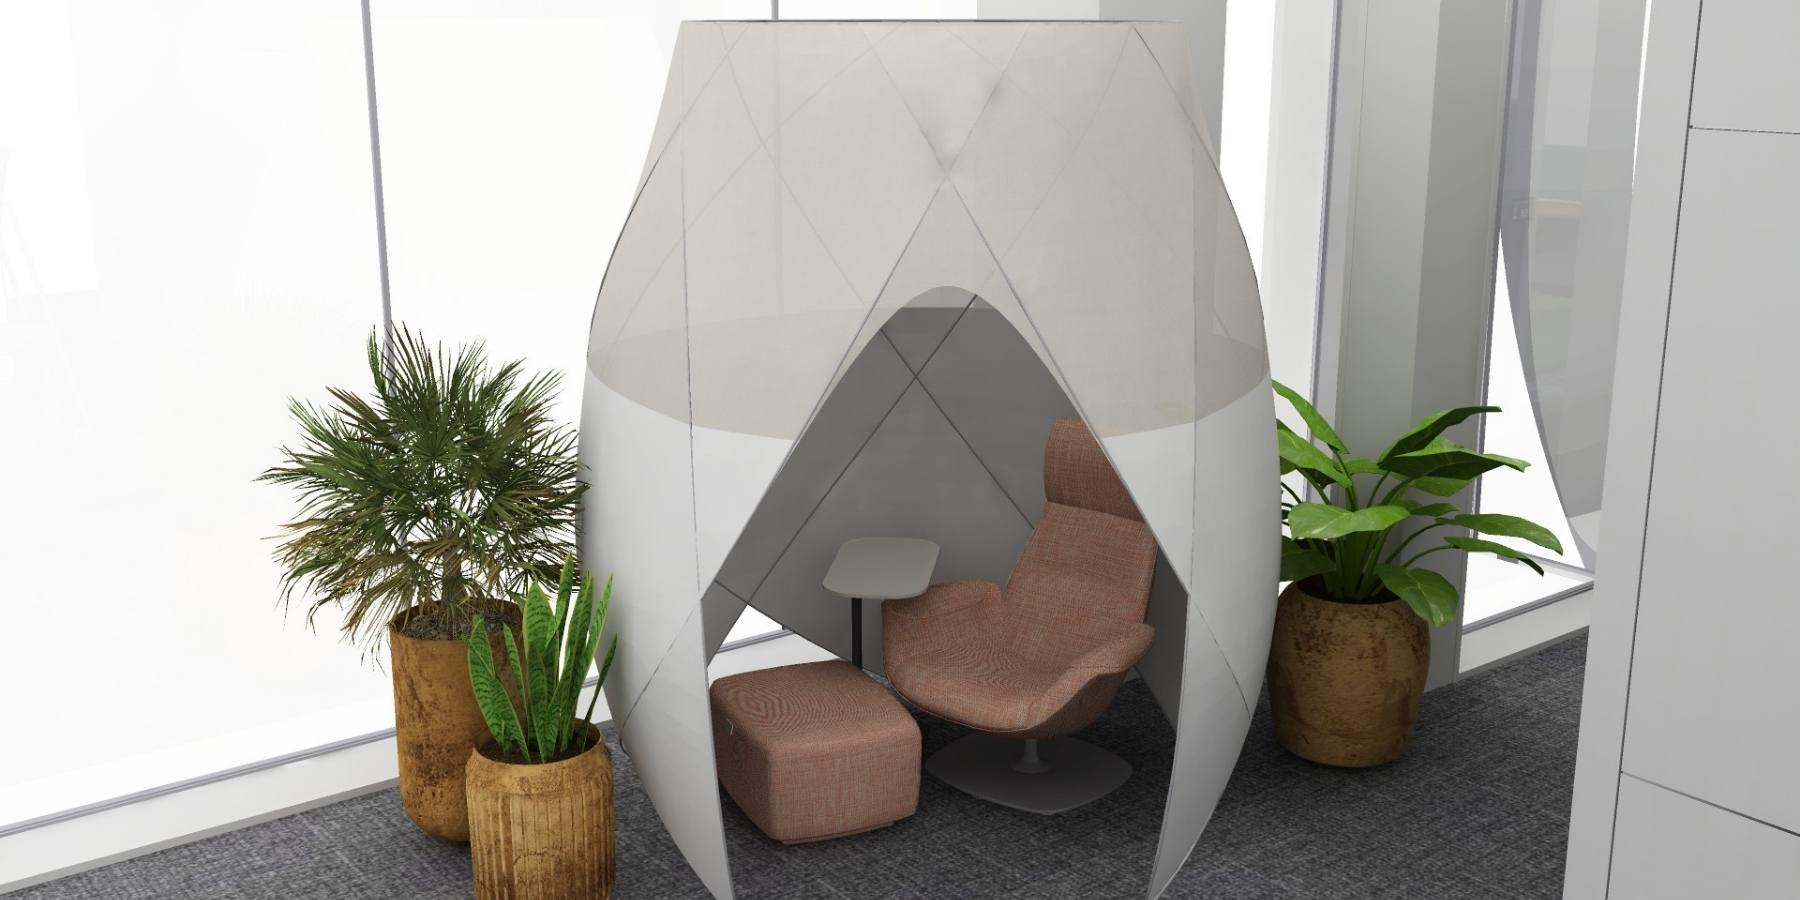 Steelcase Tent